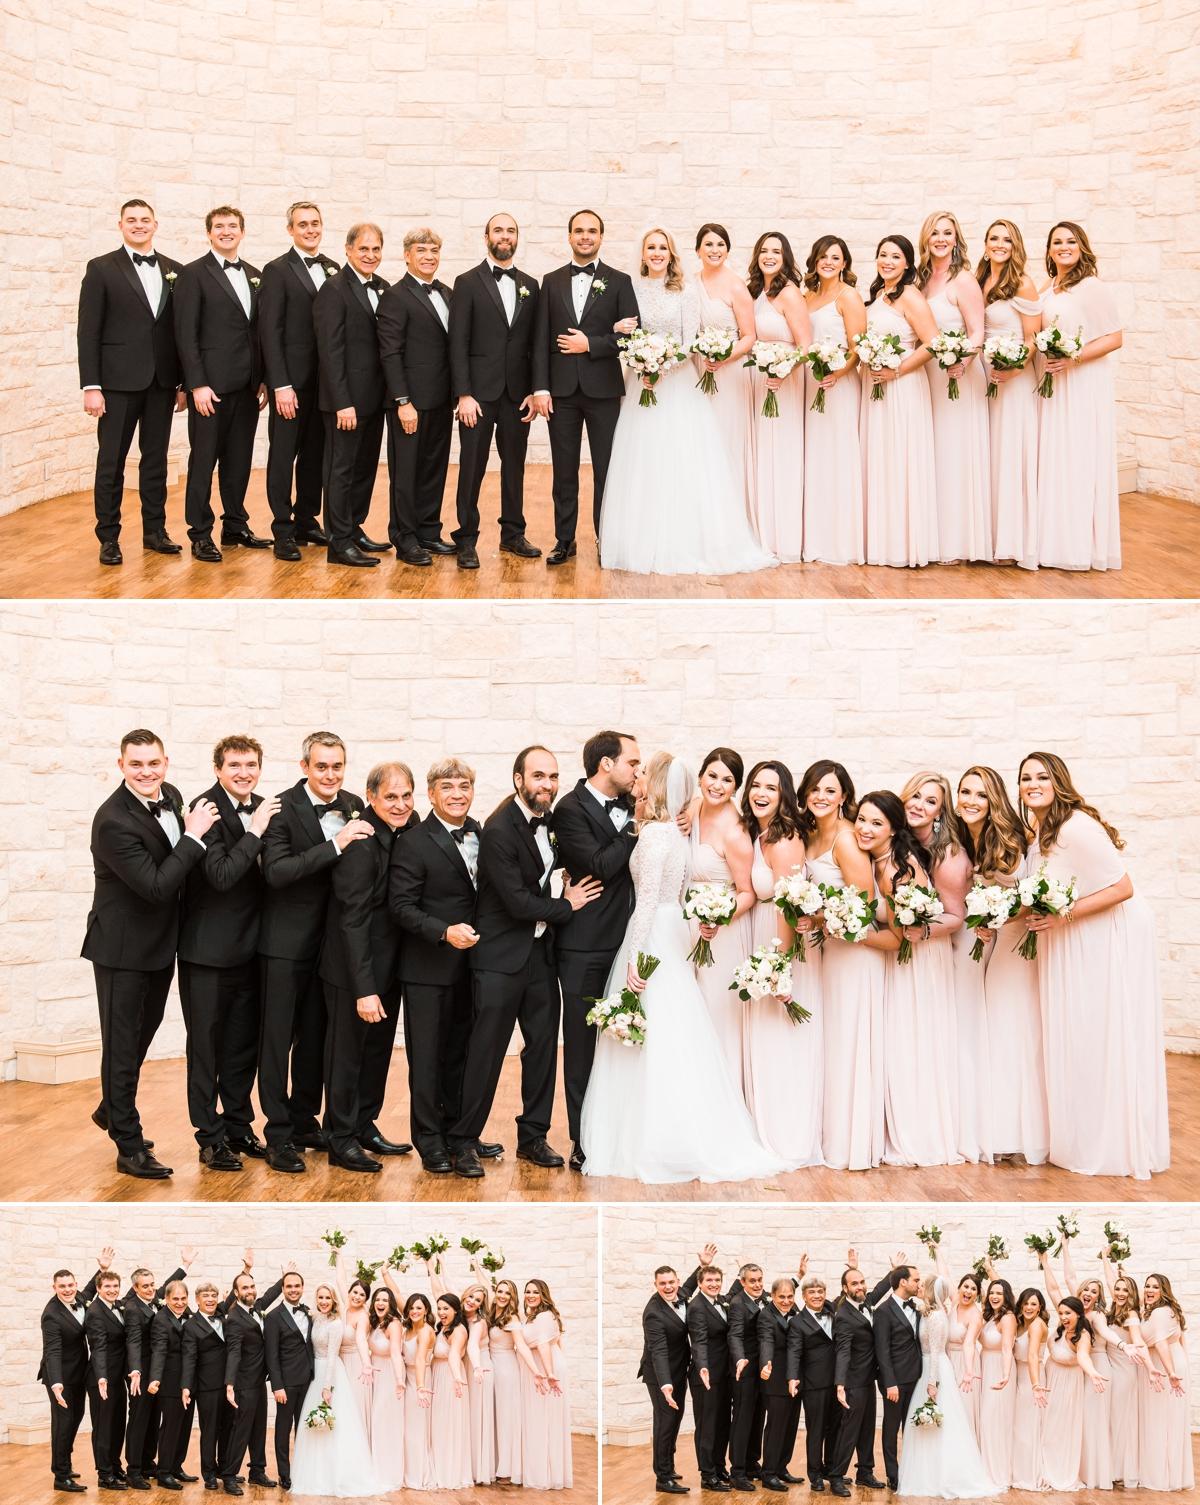 Briscoe Manor wedding party black tie and blush pink bridesmaid dresses